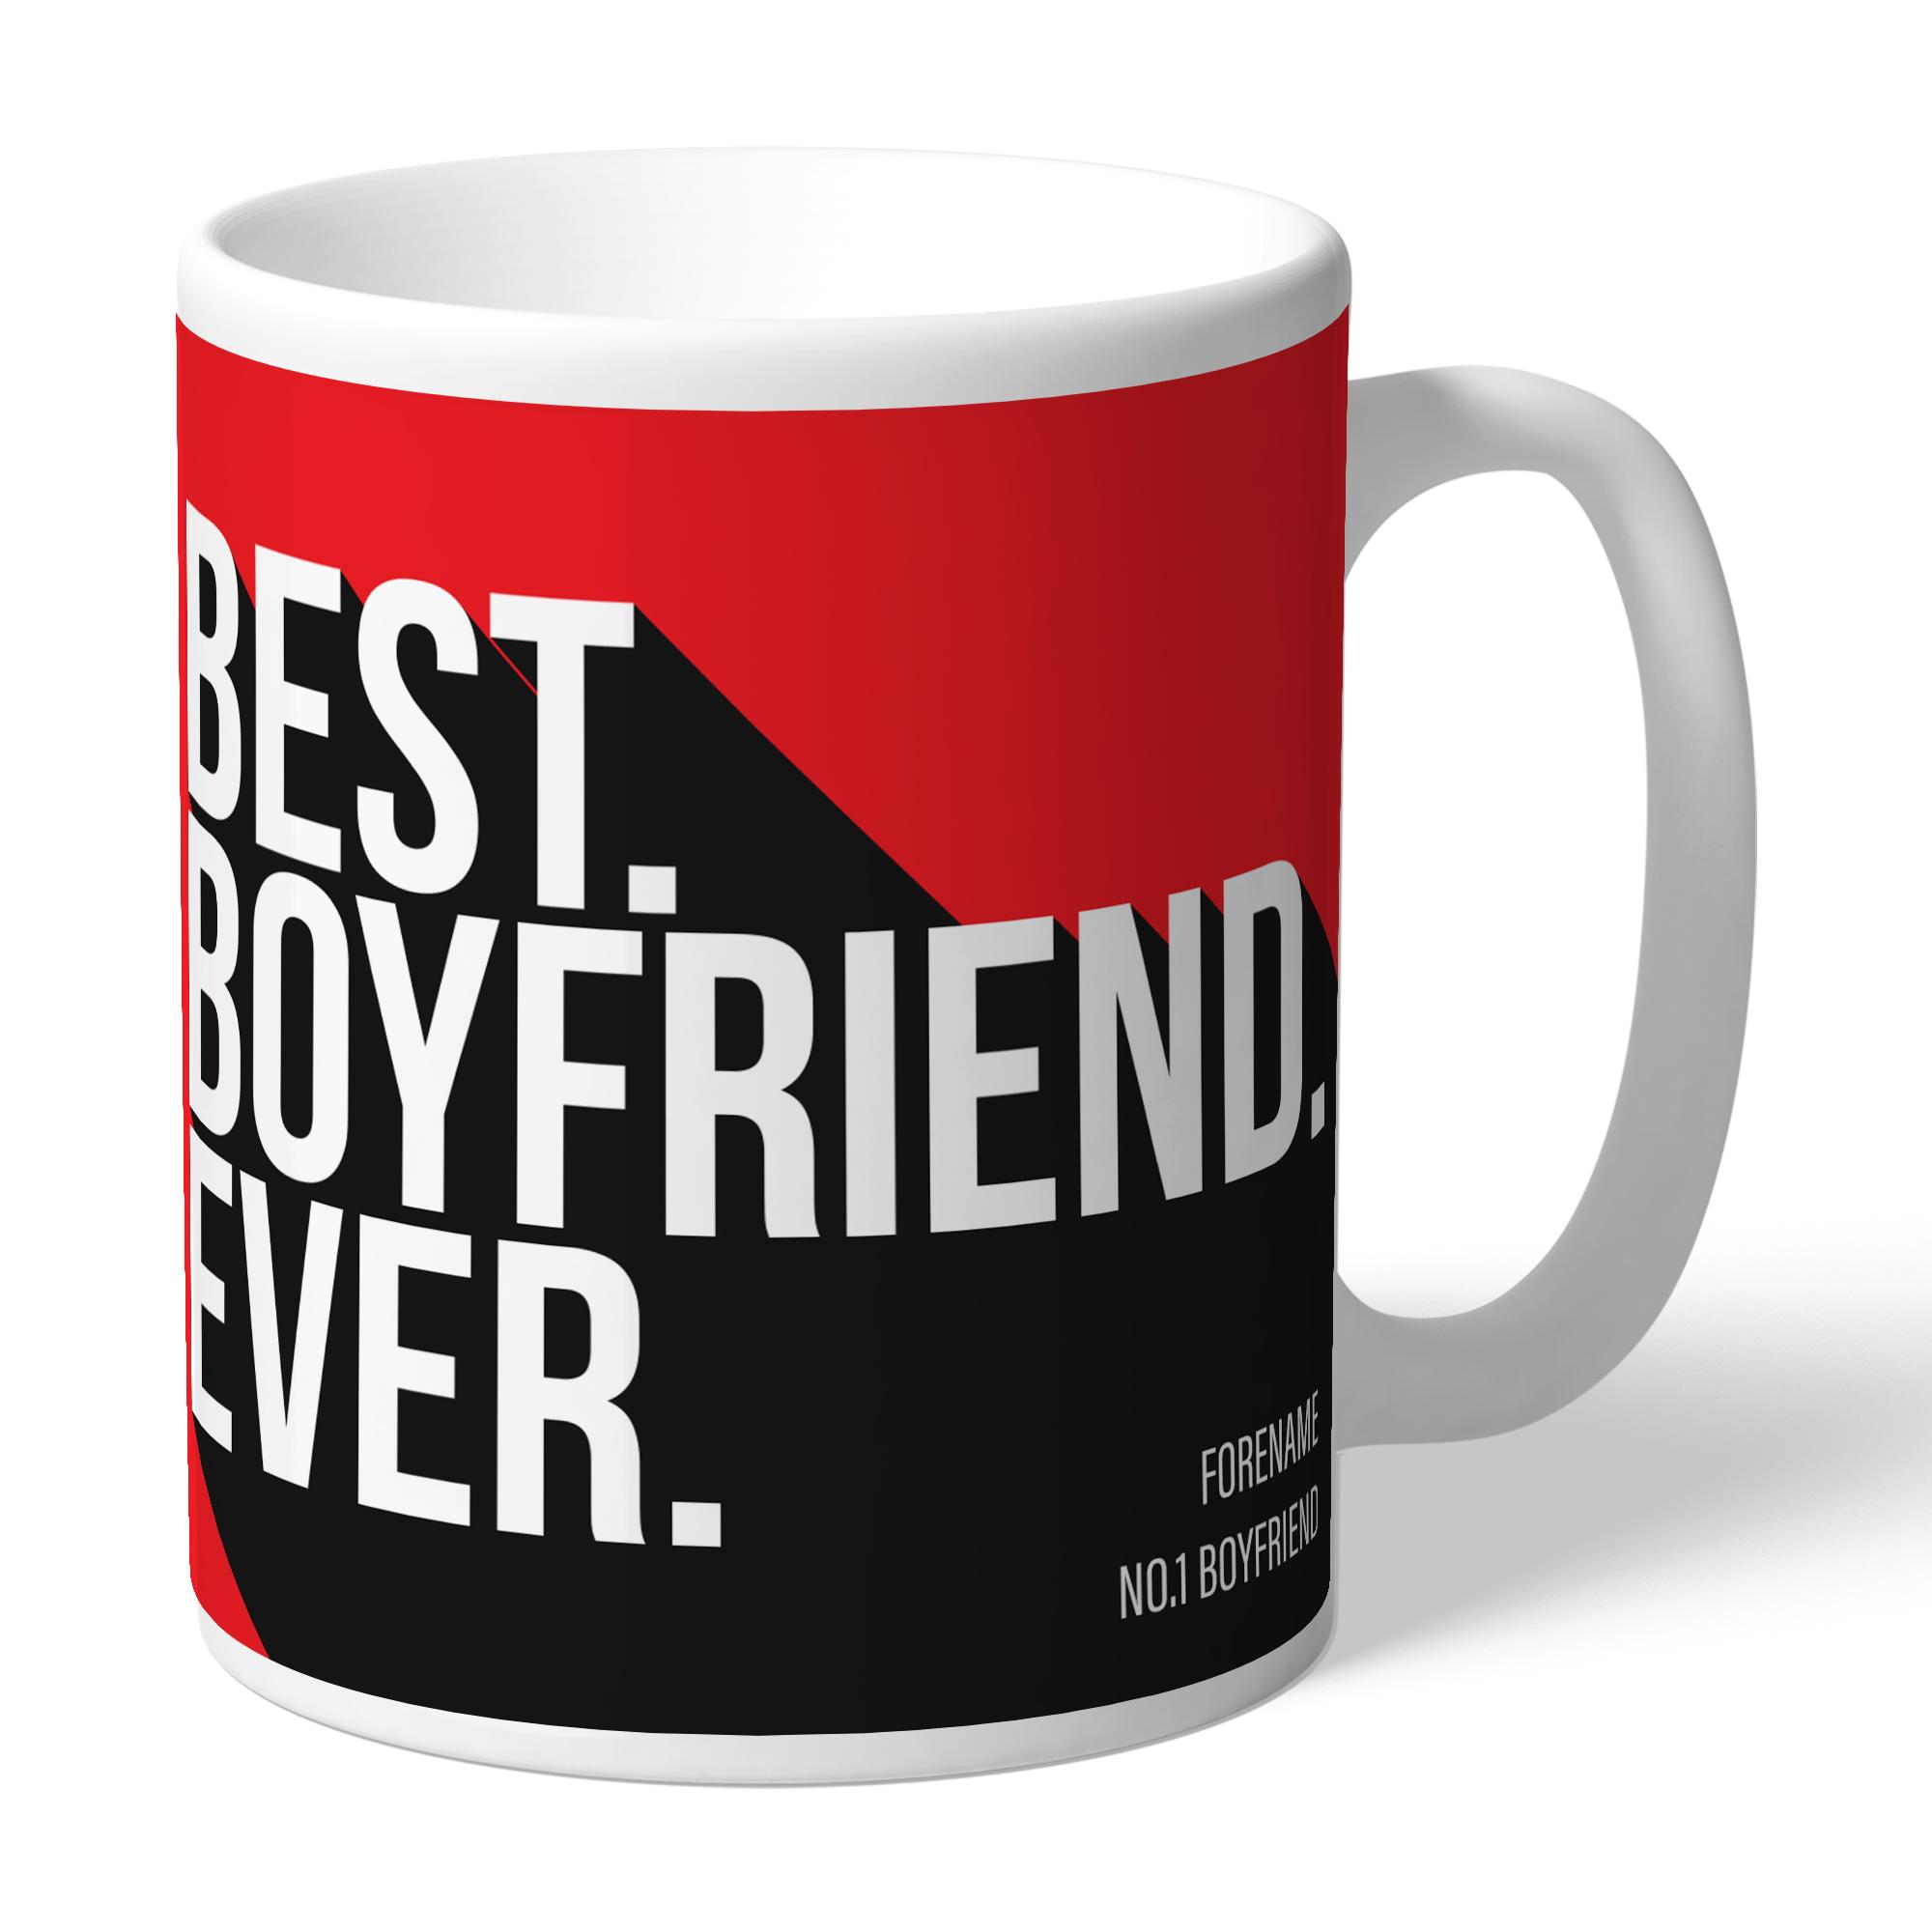 Sheffield United Best Boyfriend Ever Mug